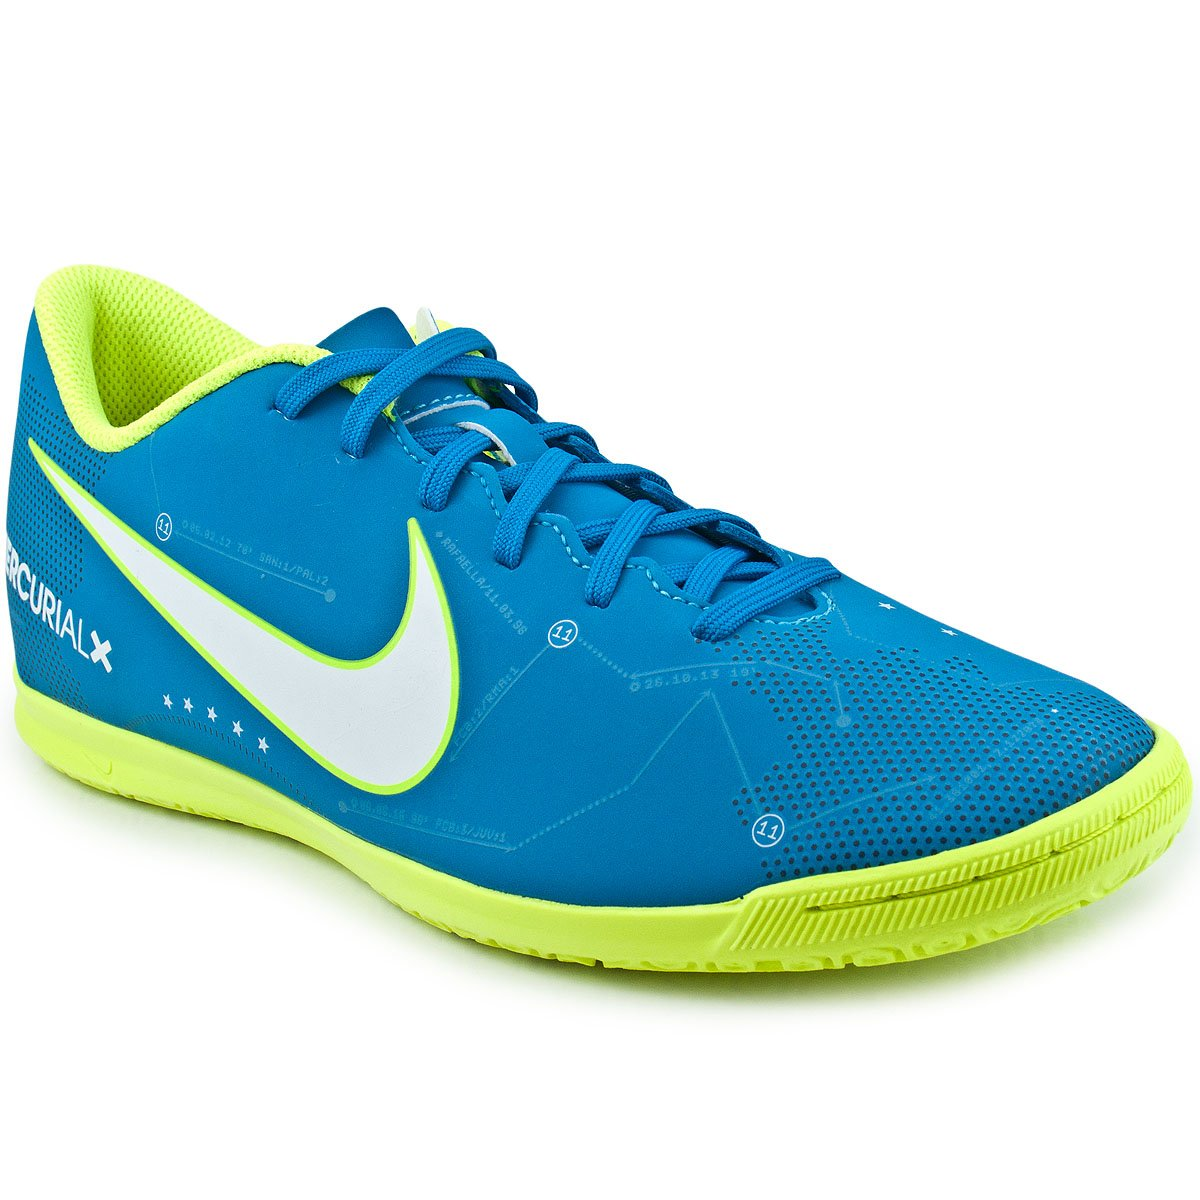 Chuteira Nike Mercurial Vortex III Neymar IC  4ce02777540e9